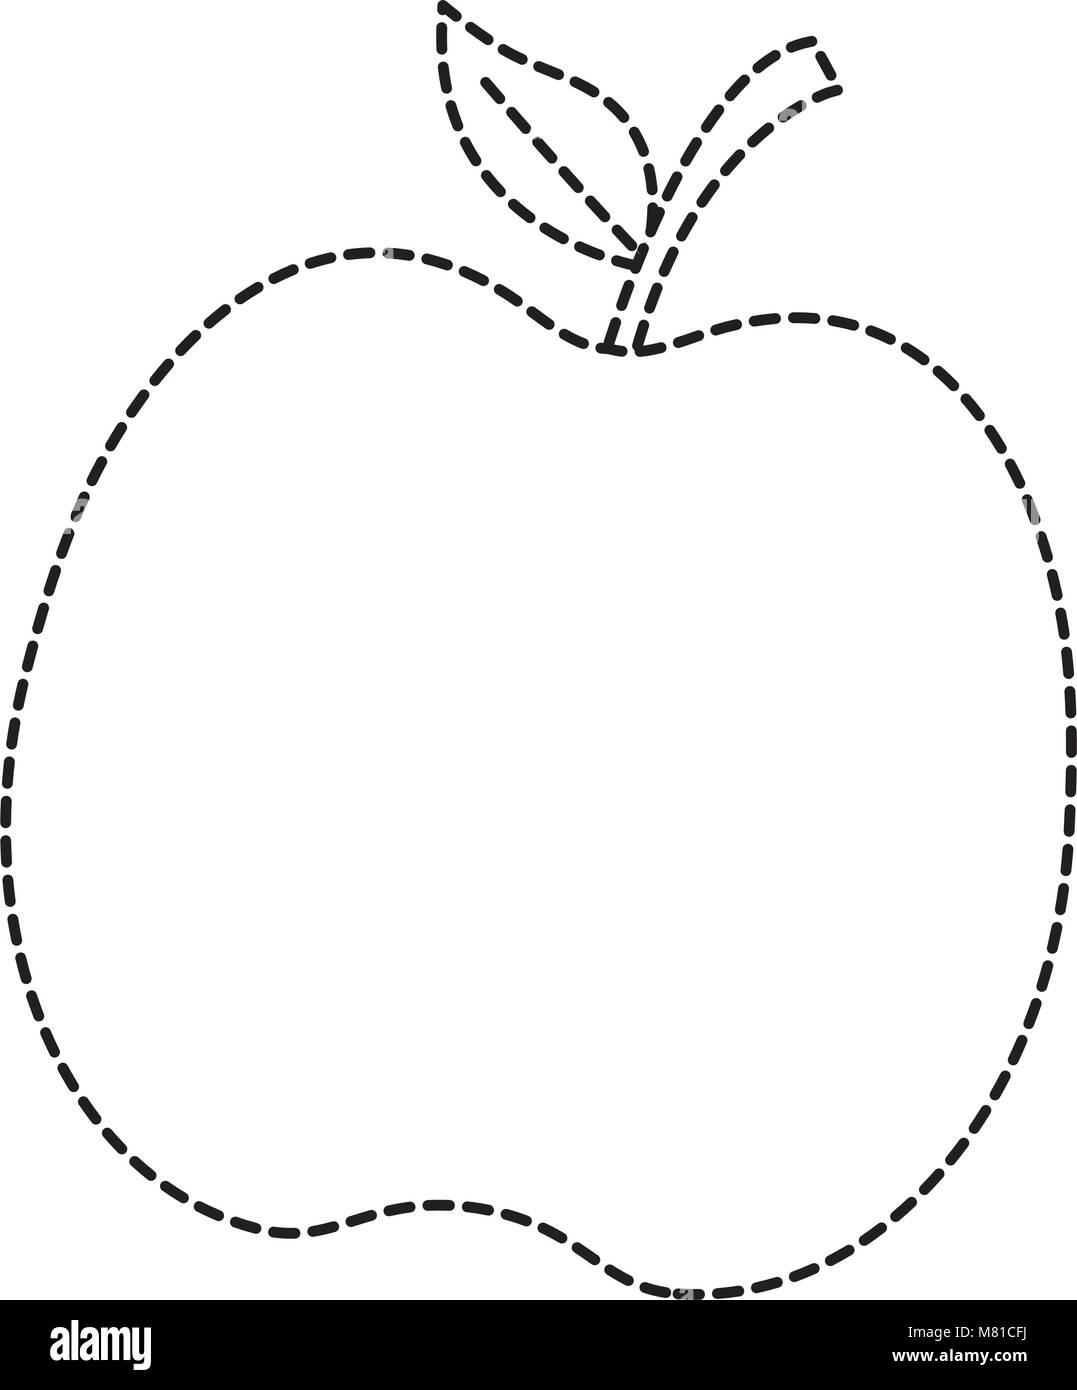 apple fruit icon over white background, vector illustration - Stock Image